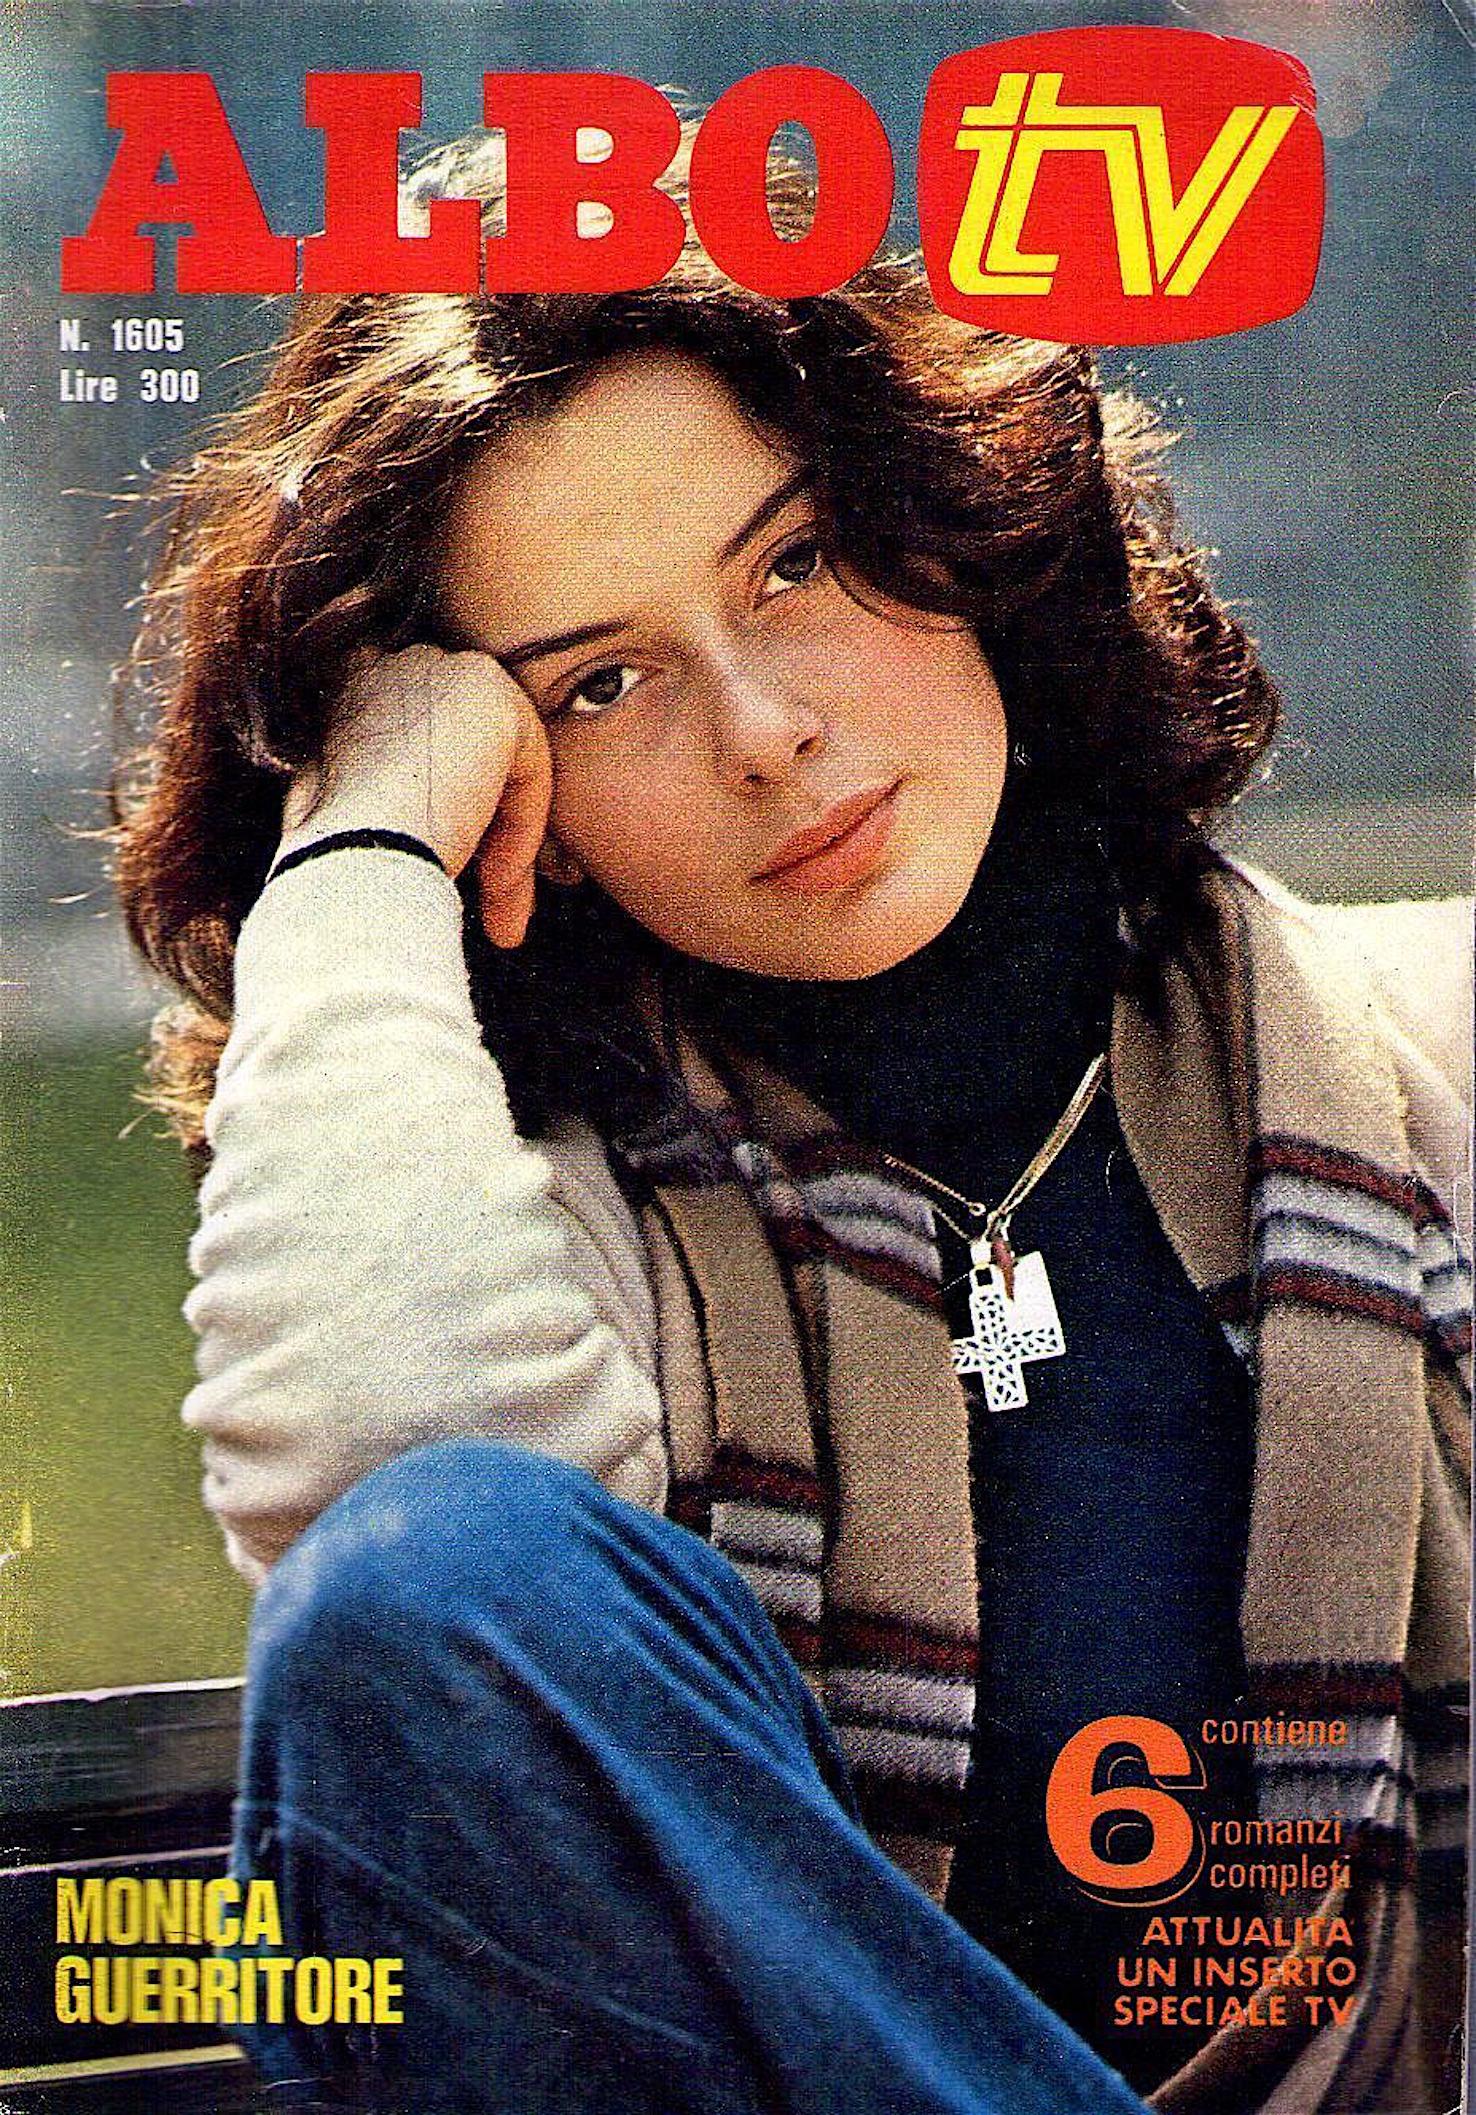 monica Guerritore albo tv 1976 copertina